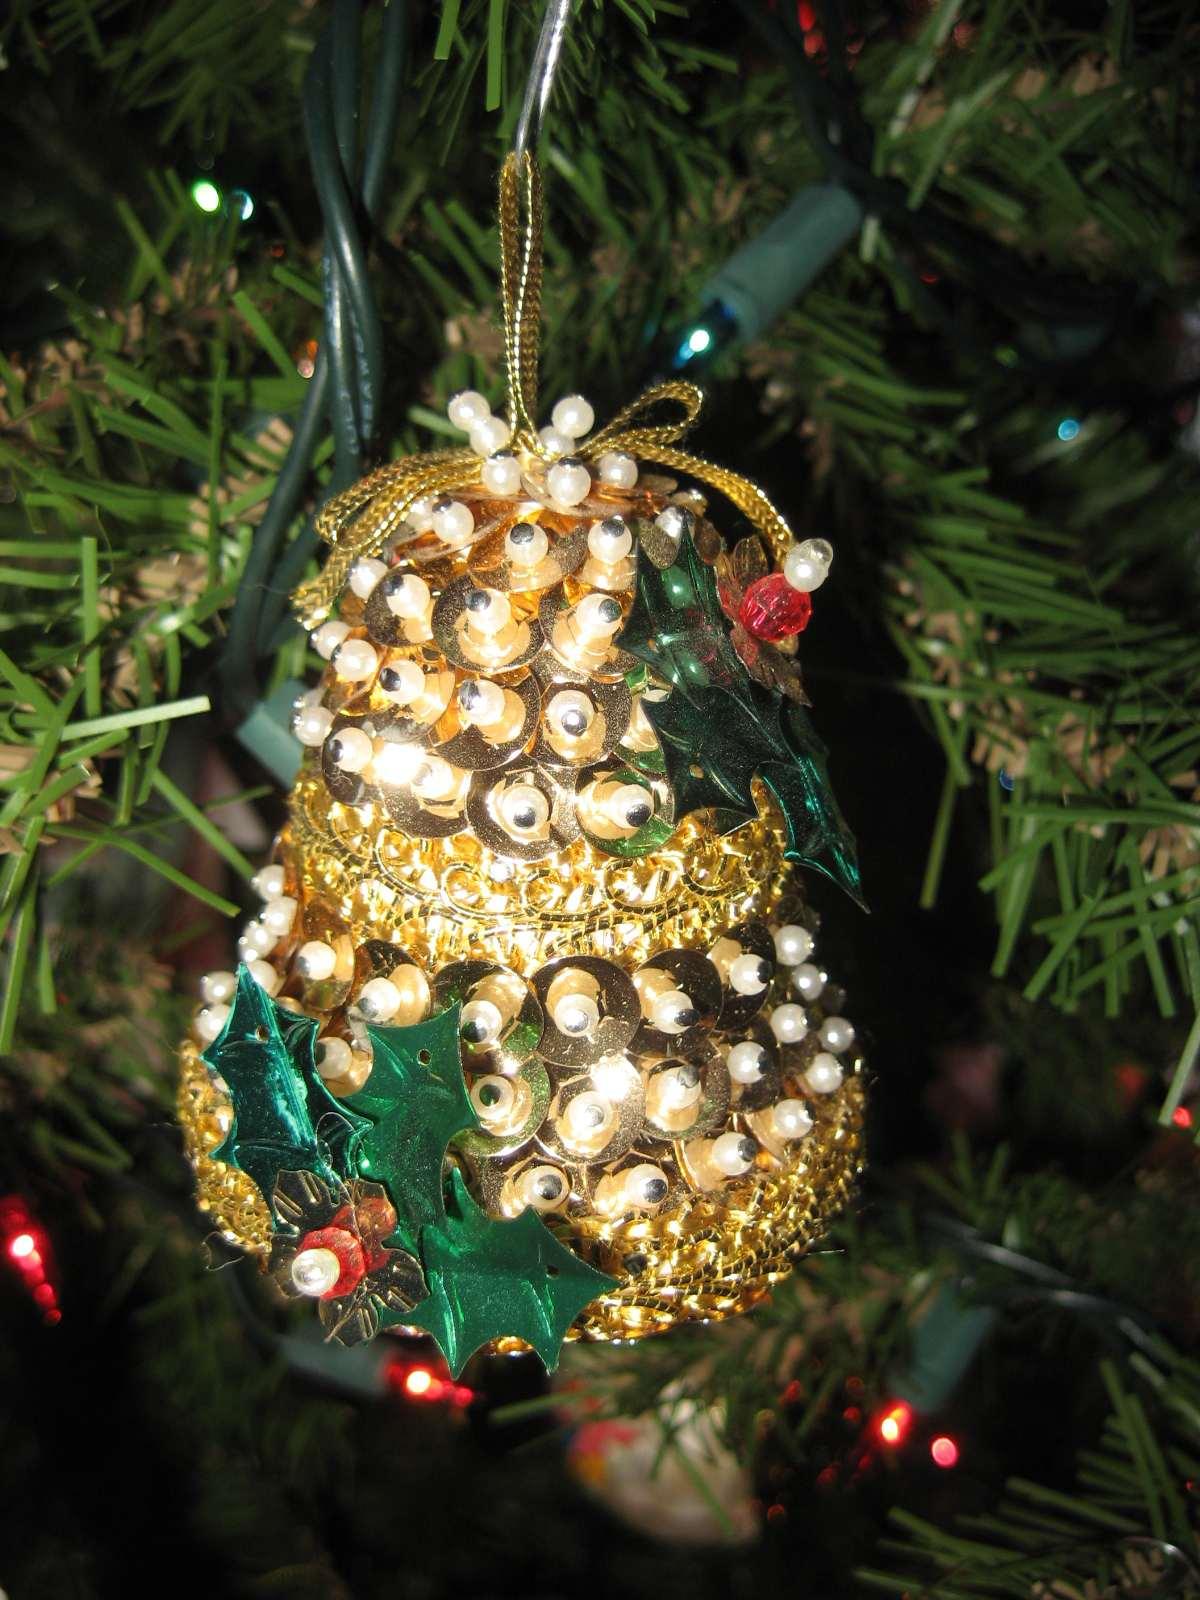 Vintage Christmas Ornaments Pictures Amp Photos